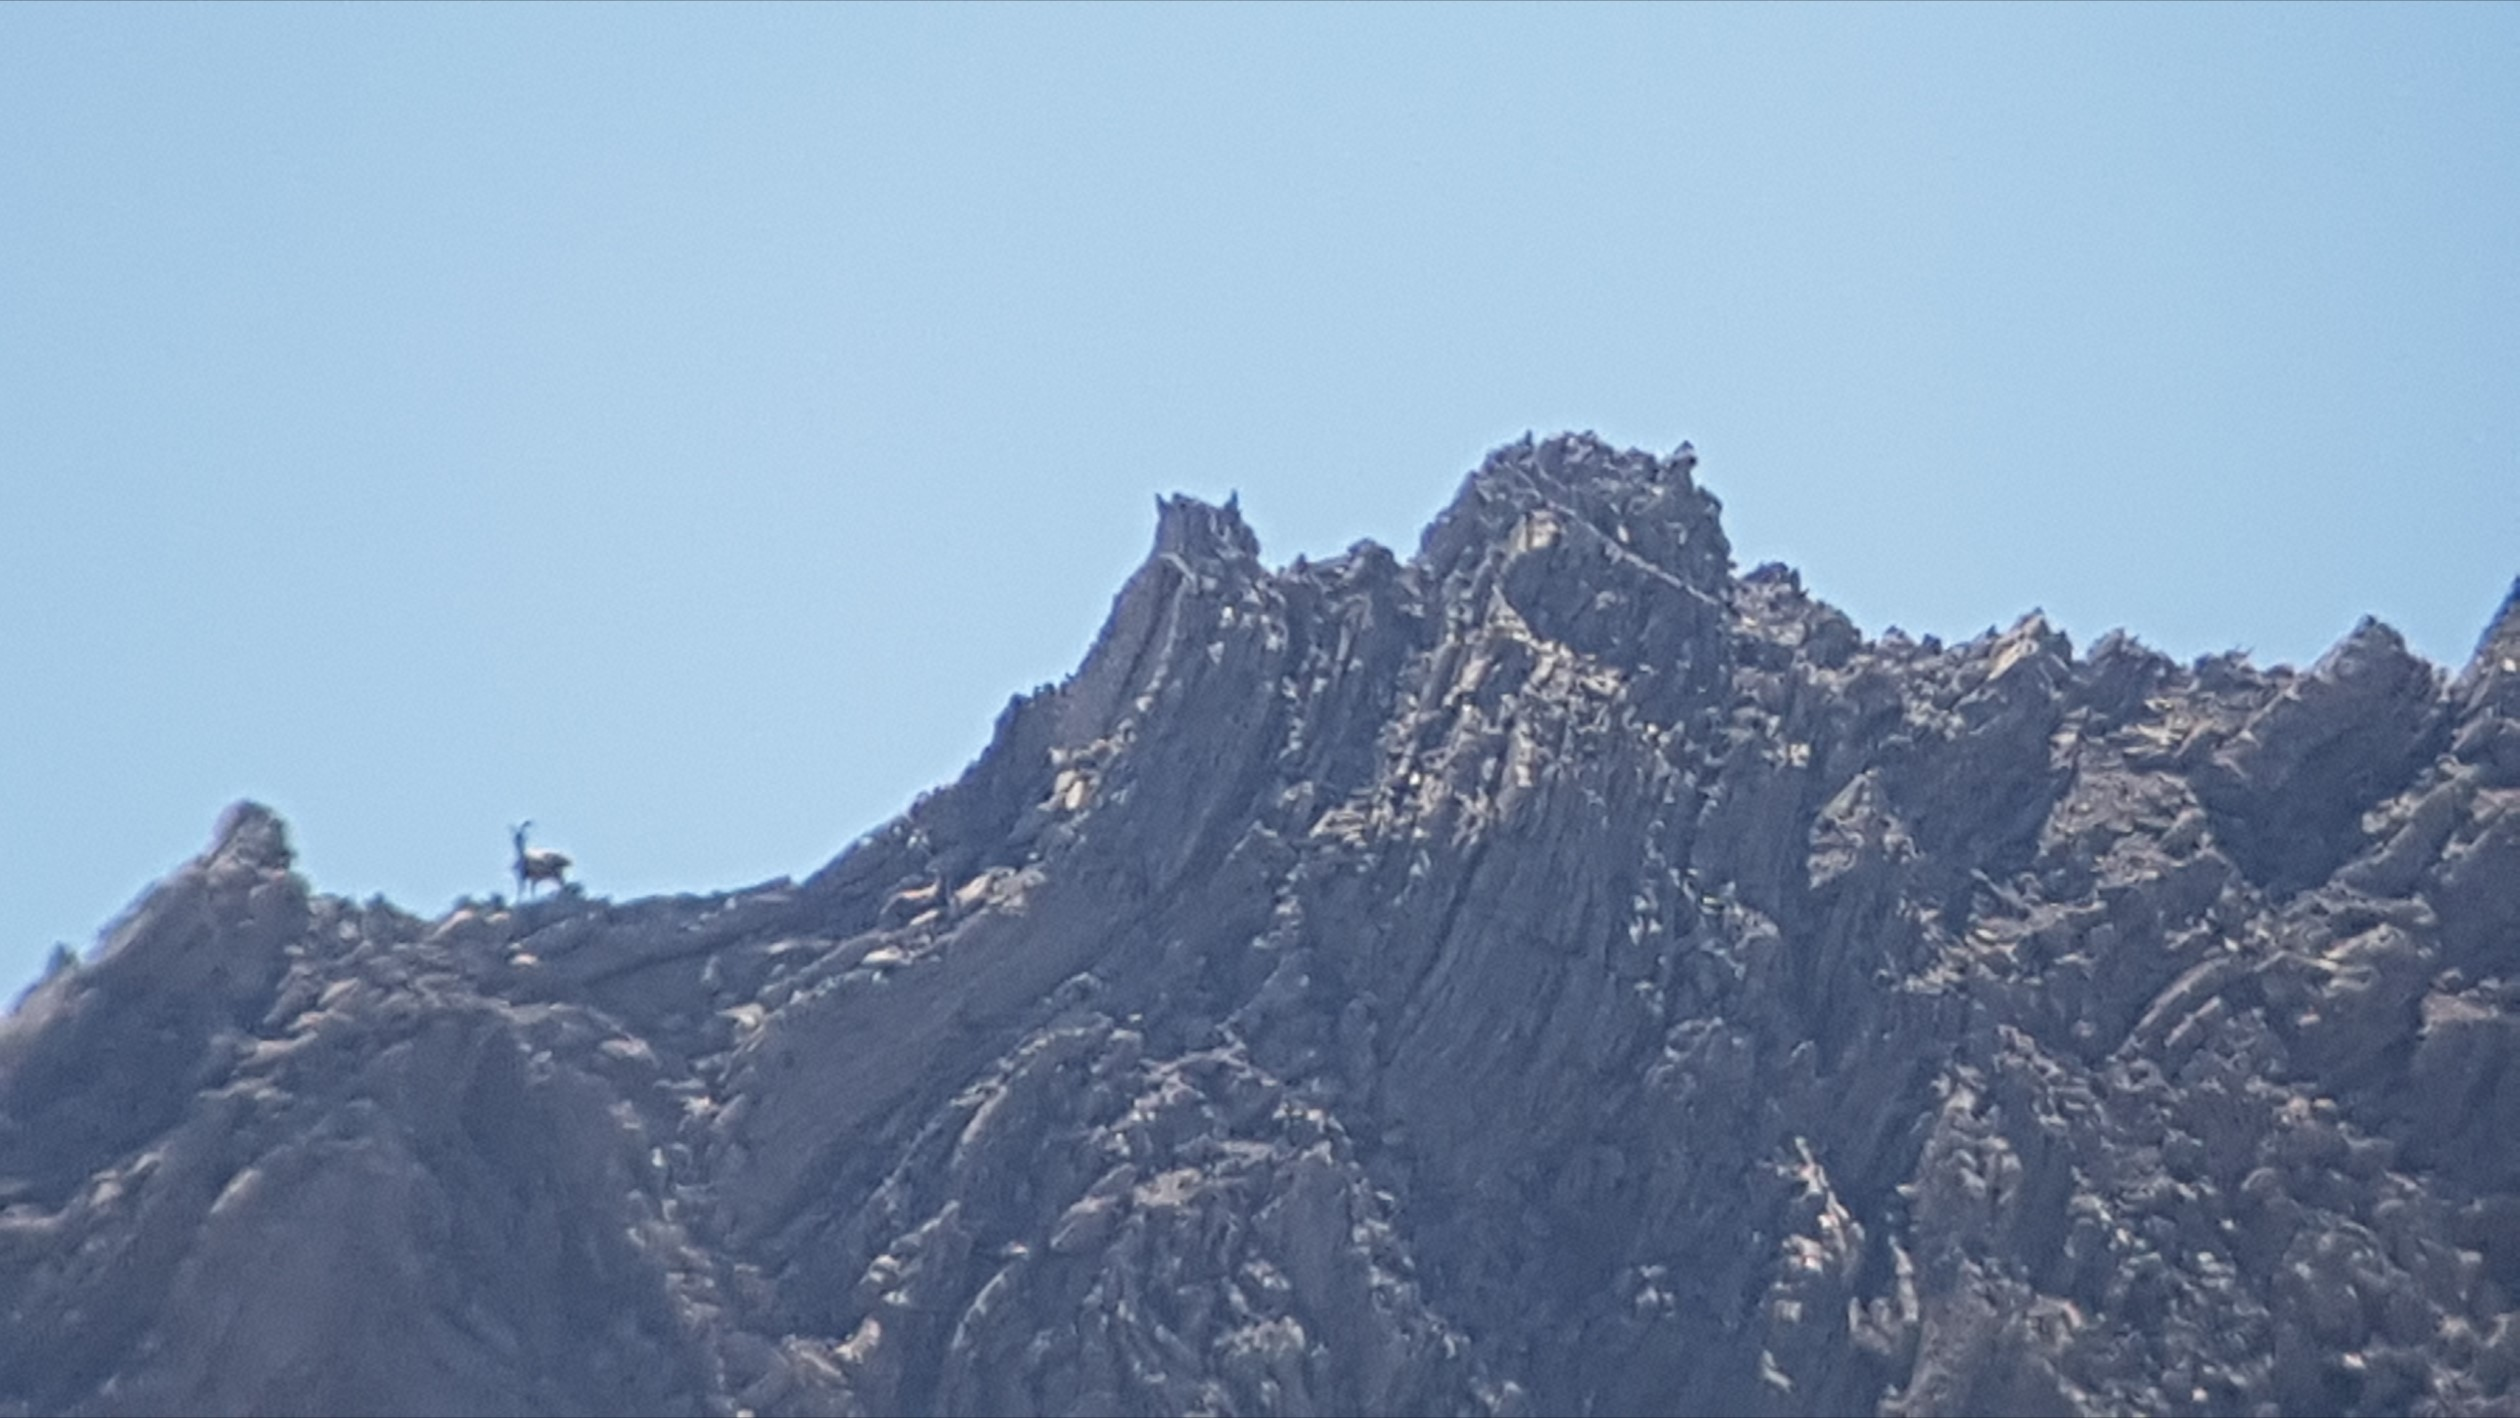 Engadine, National Park, S-chanf, Varusch, Val Trupchun, Alp Trupchun, view on Piz Chaschauna with one Ibex